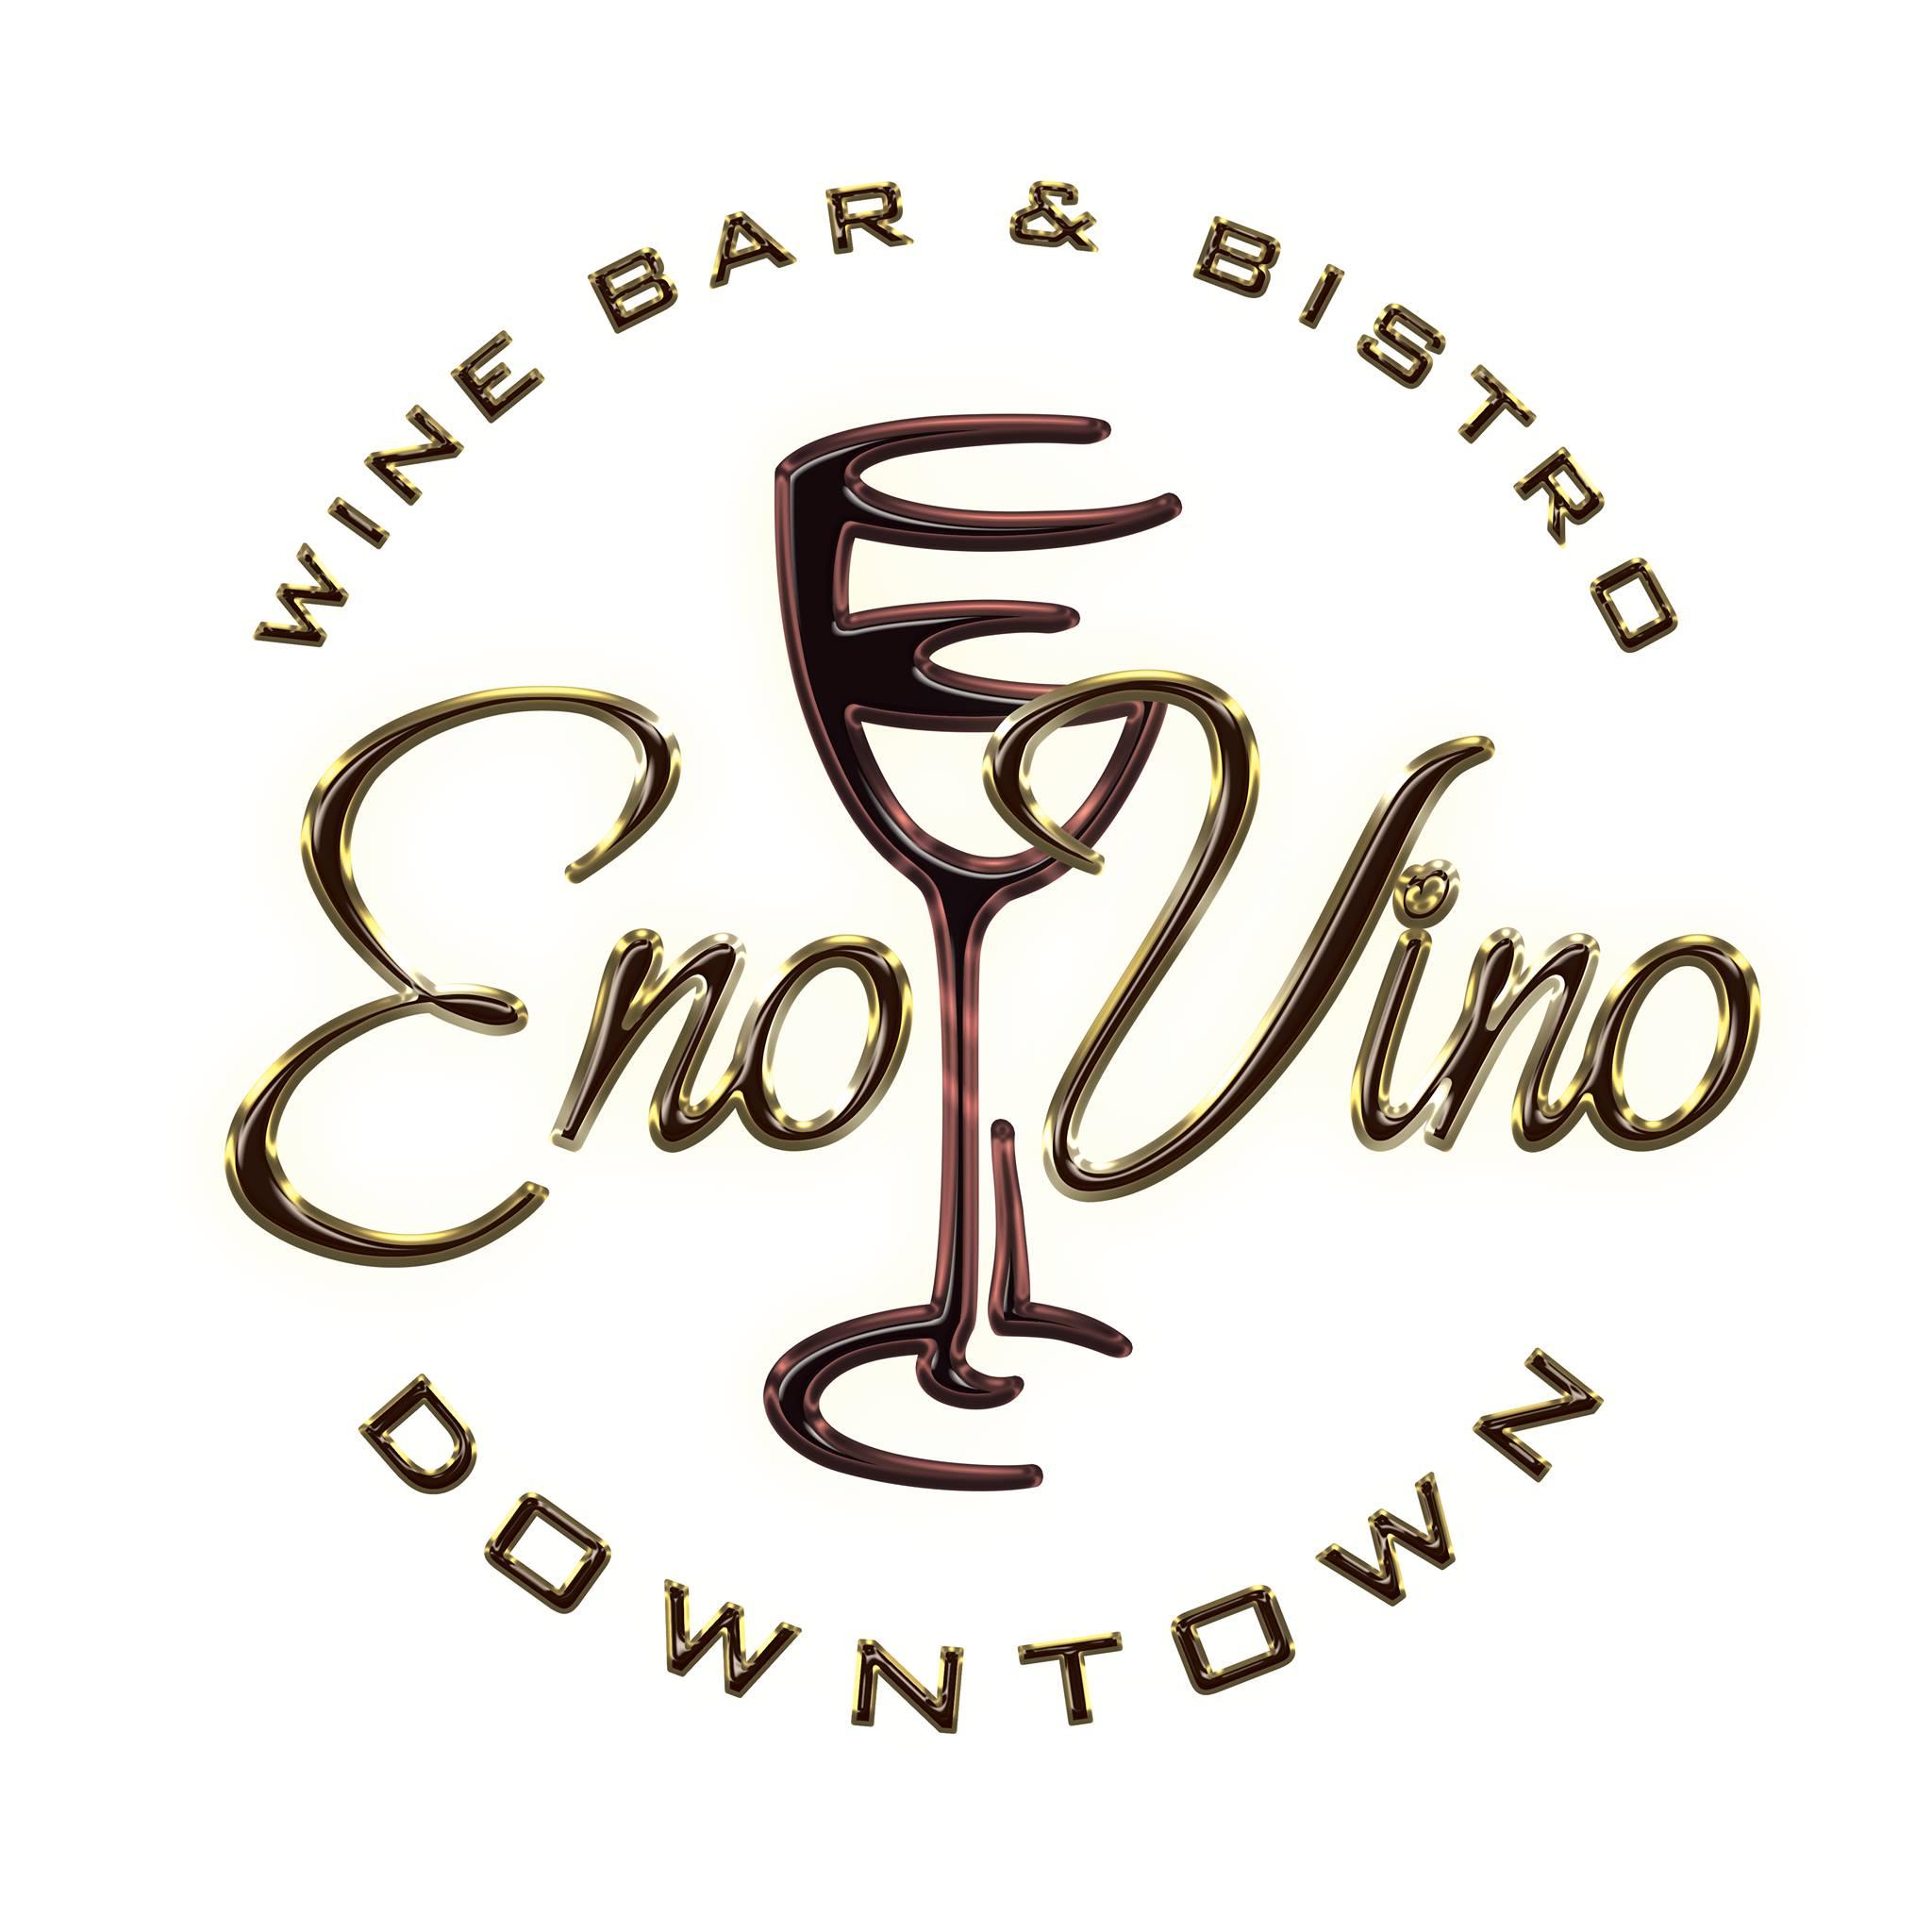 Copy of Eno-Vino-logo.jpg